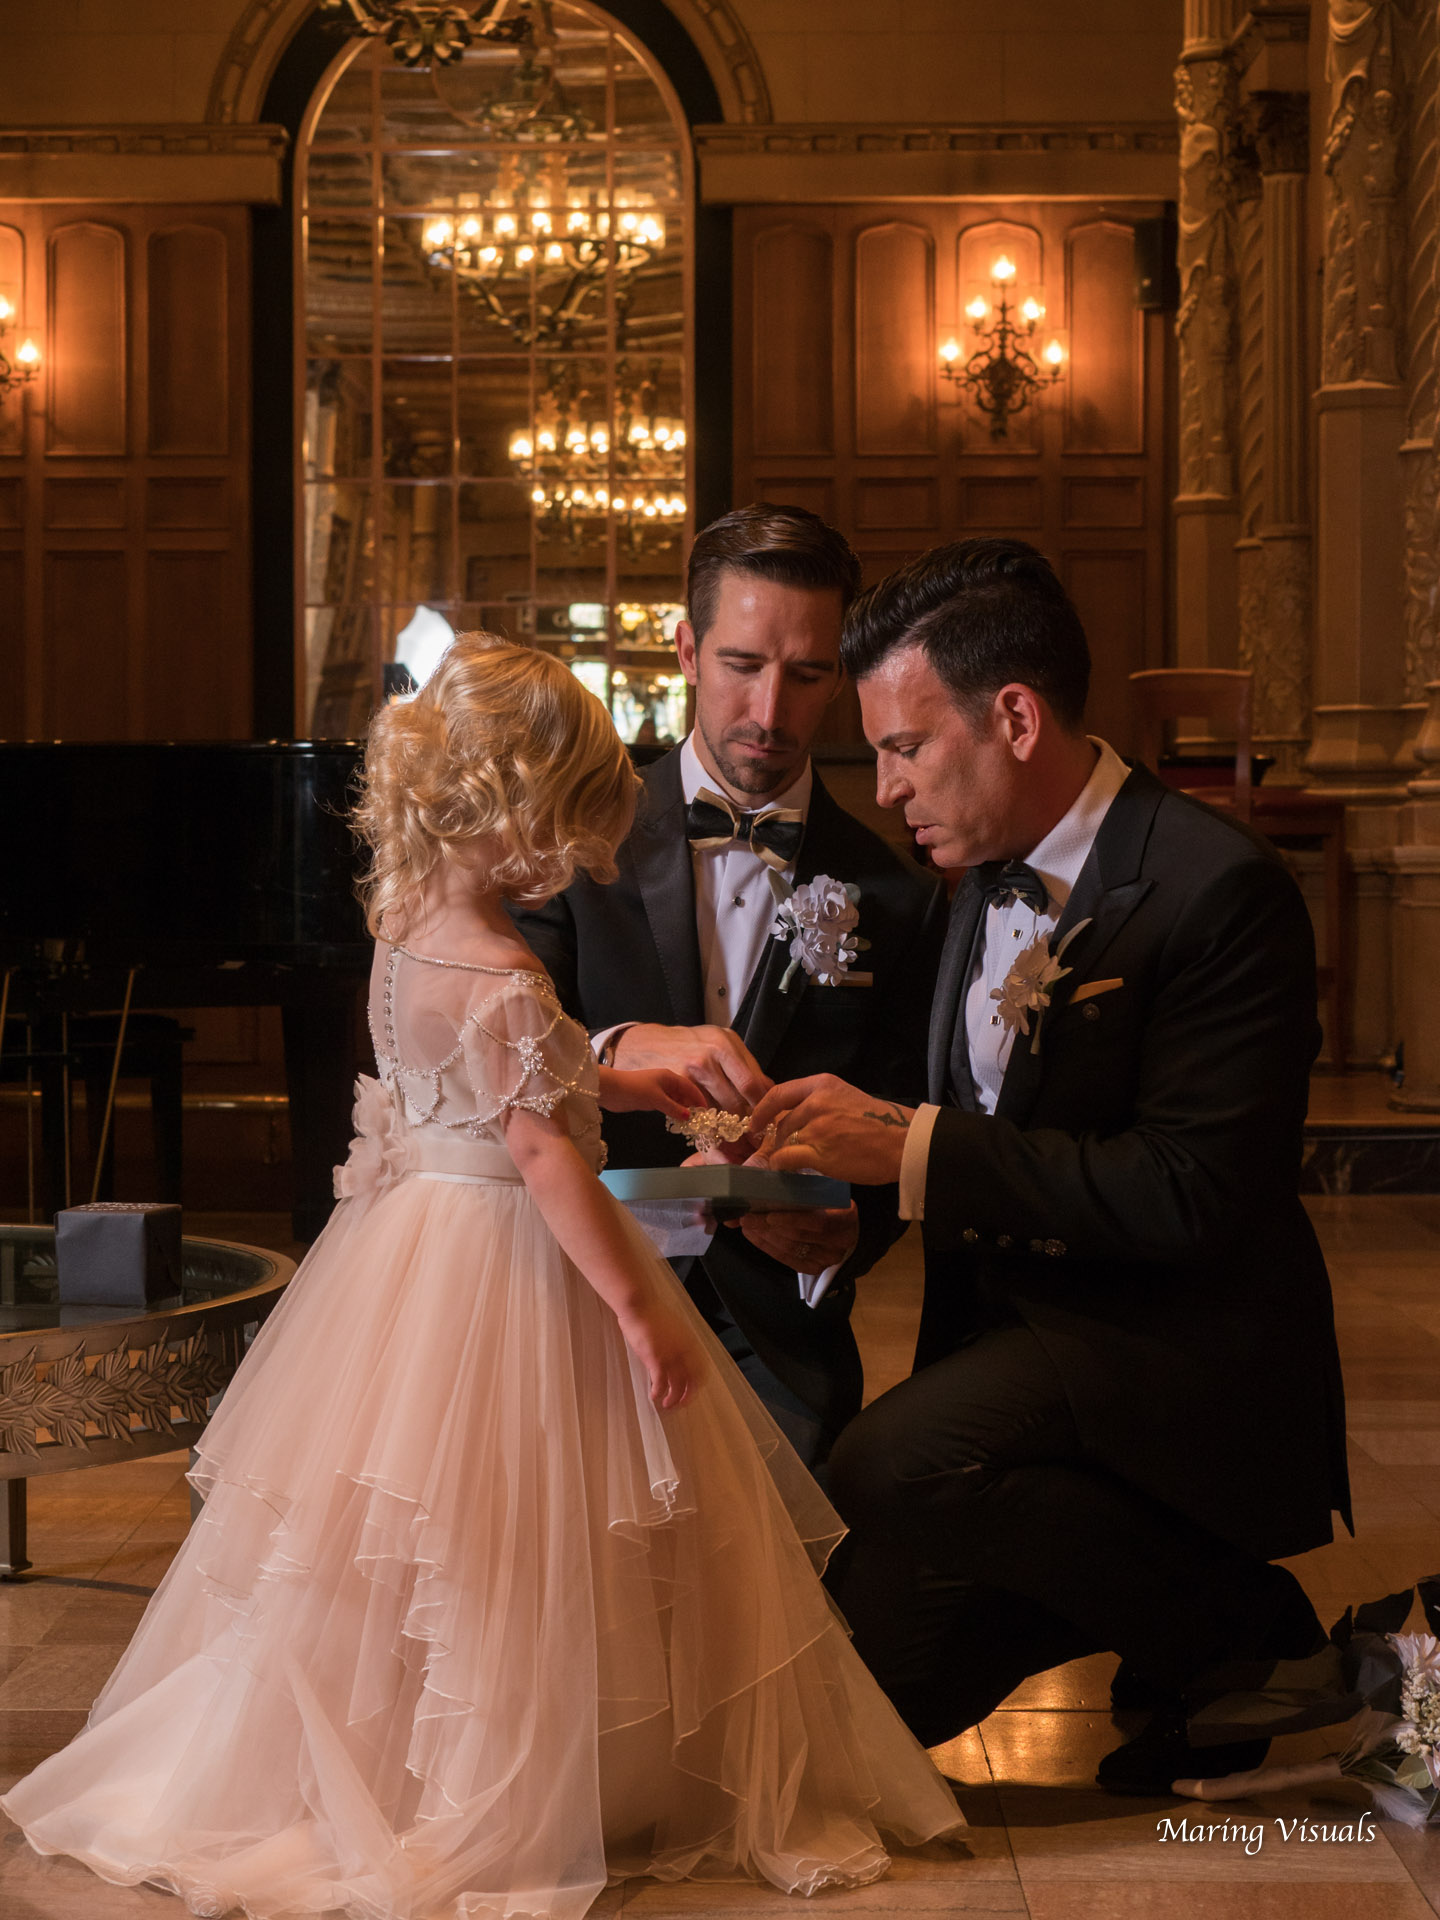 David Tutera Weddings by Maring Visuals 00507.jpg